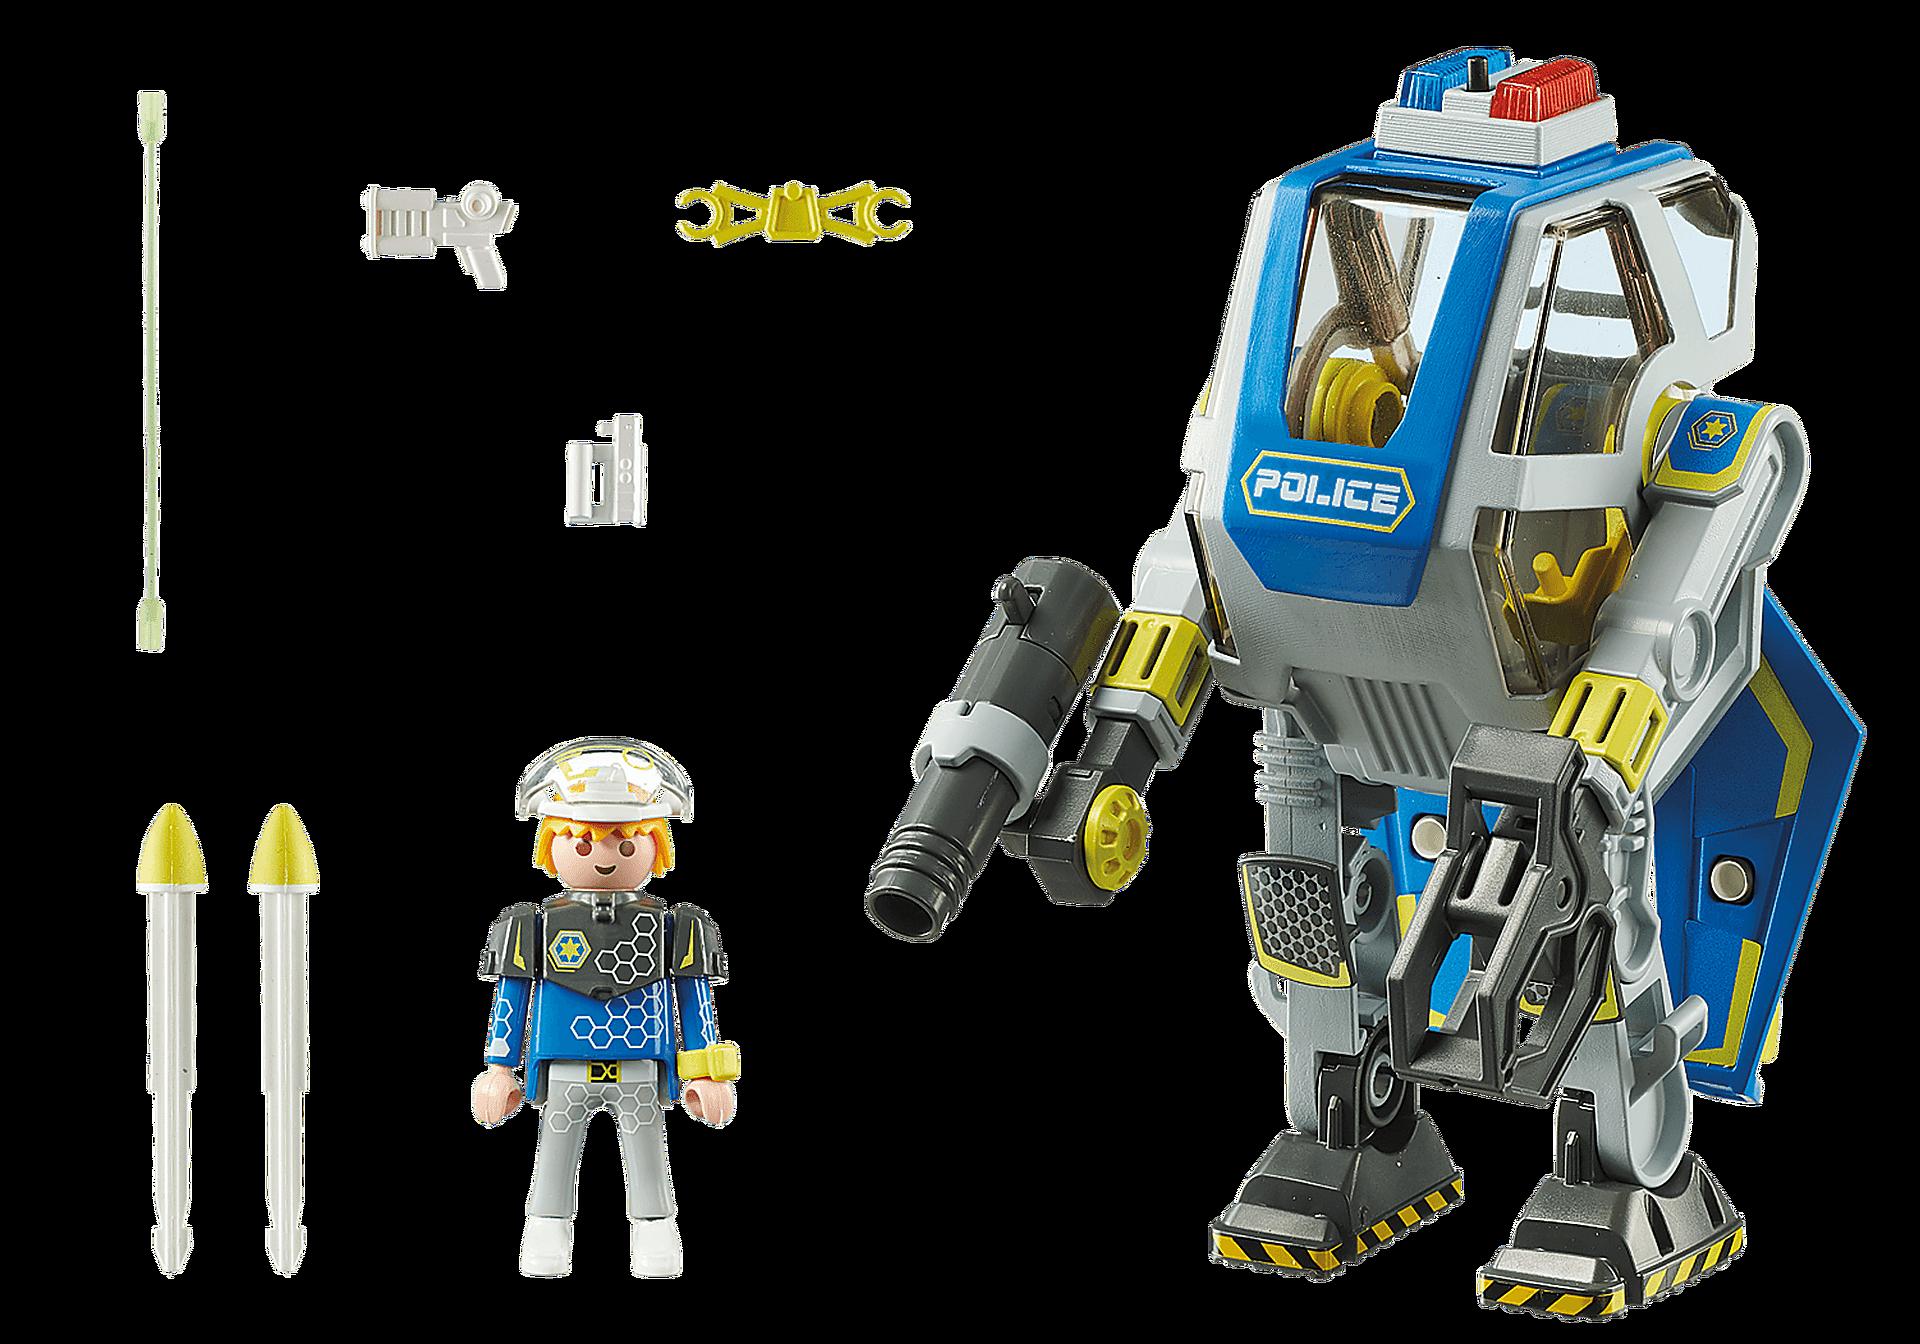 70021 Polícia Galáctica Robot zoom image3